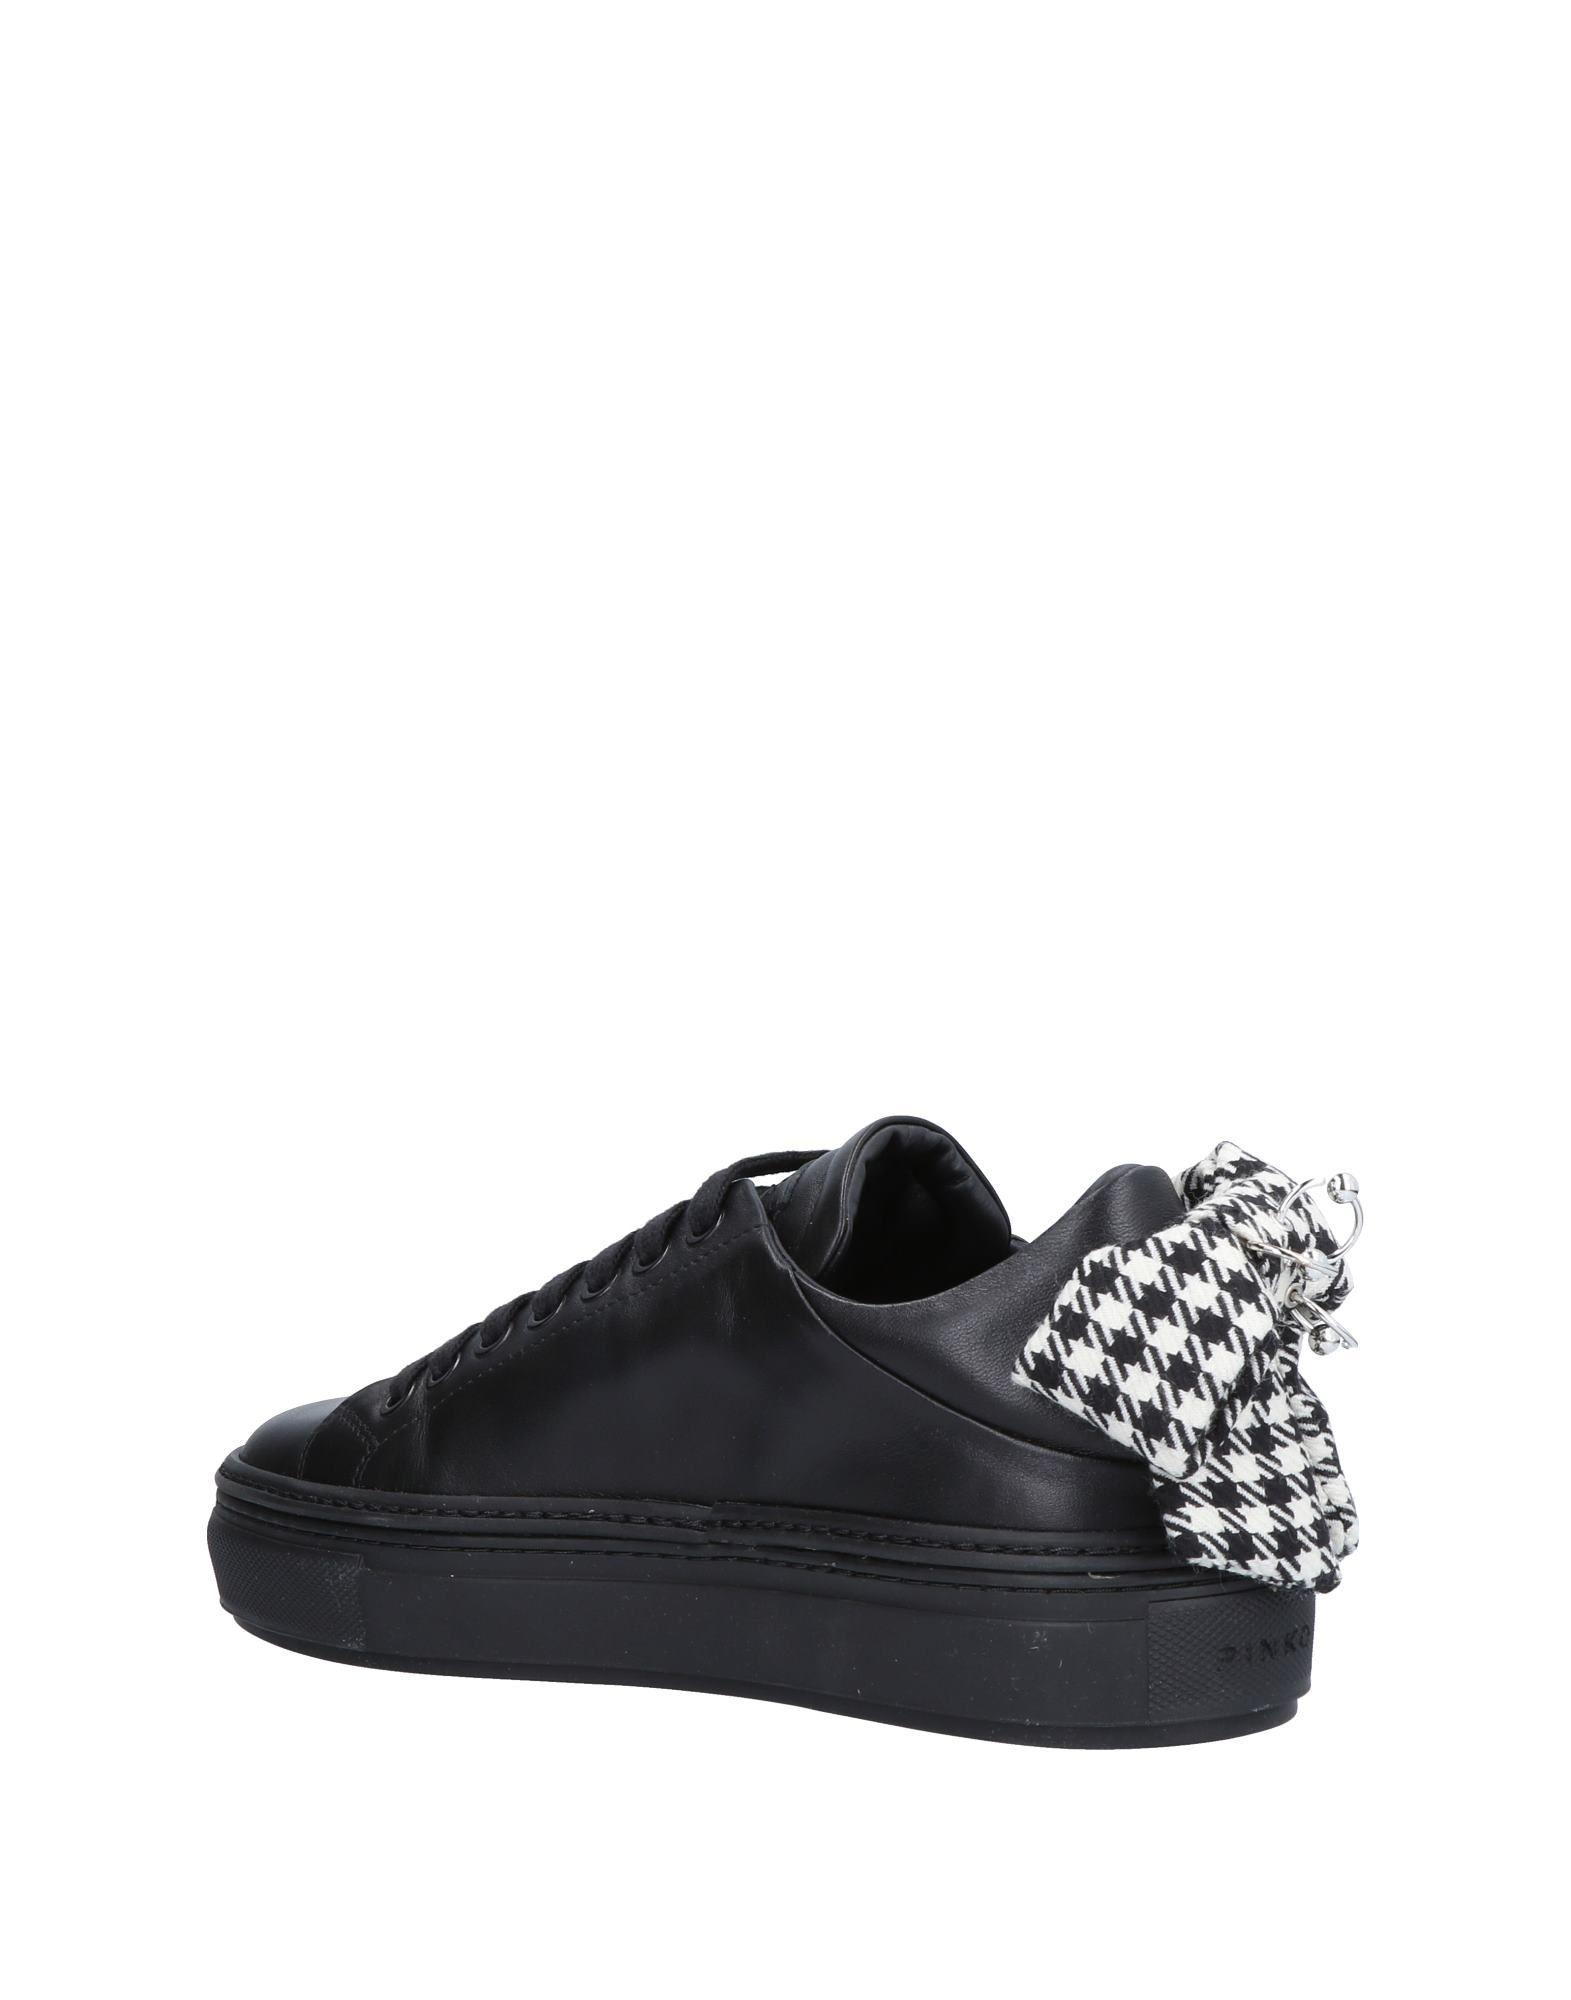 Stilvolle Damen billige Schuhe Pinko Sneakers Damen Stilvolle  11513653LP 24ae2e